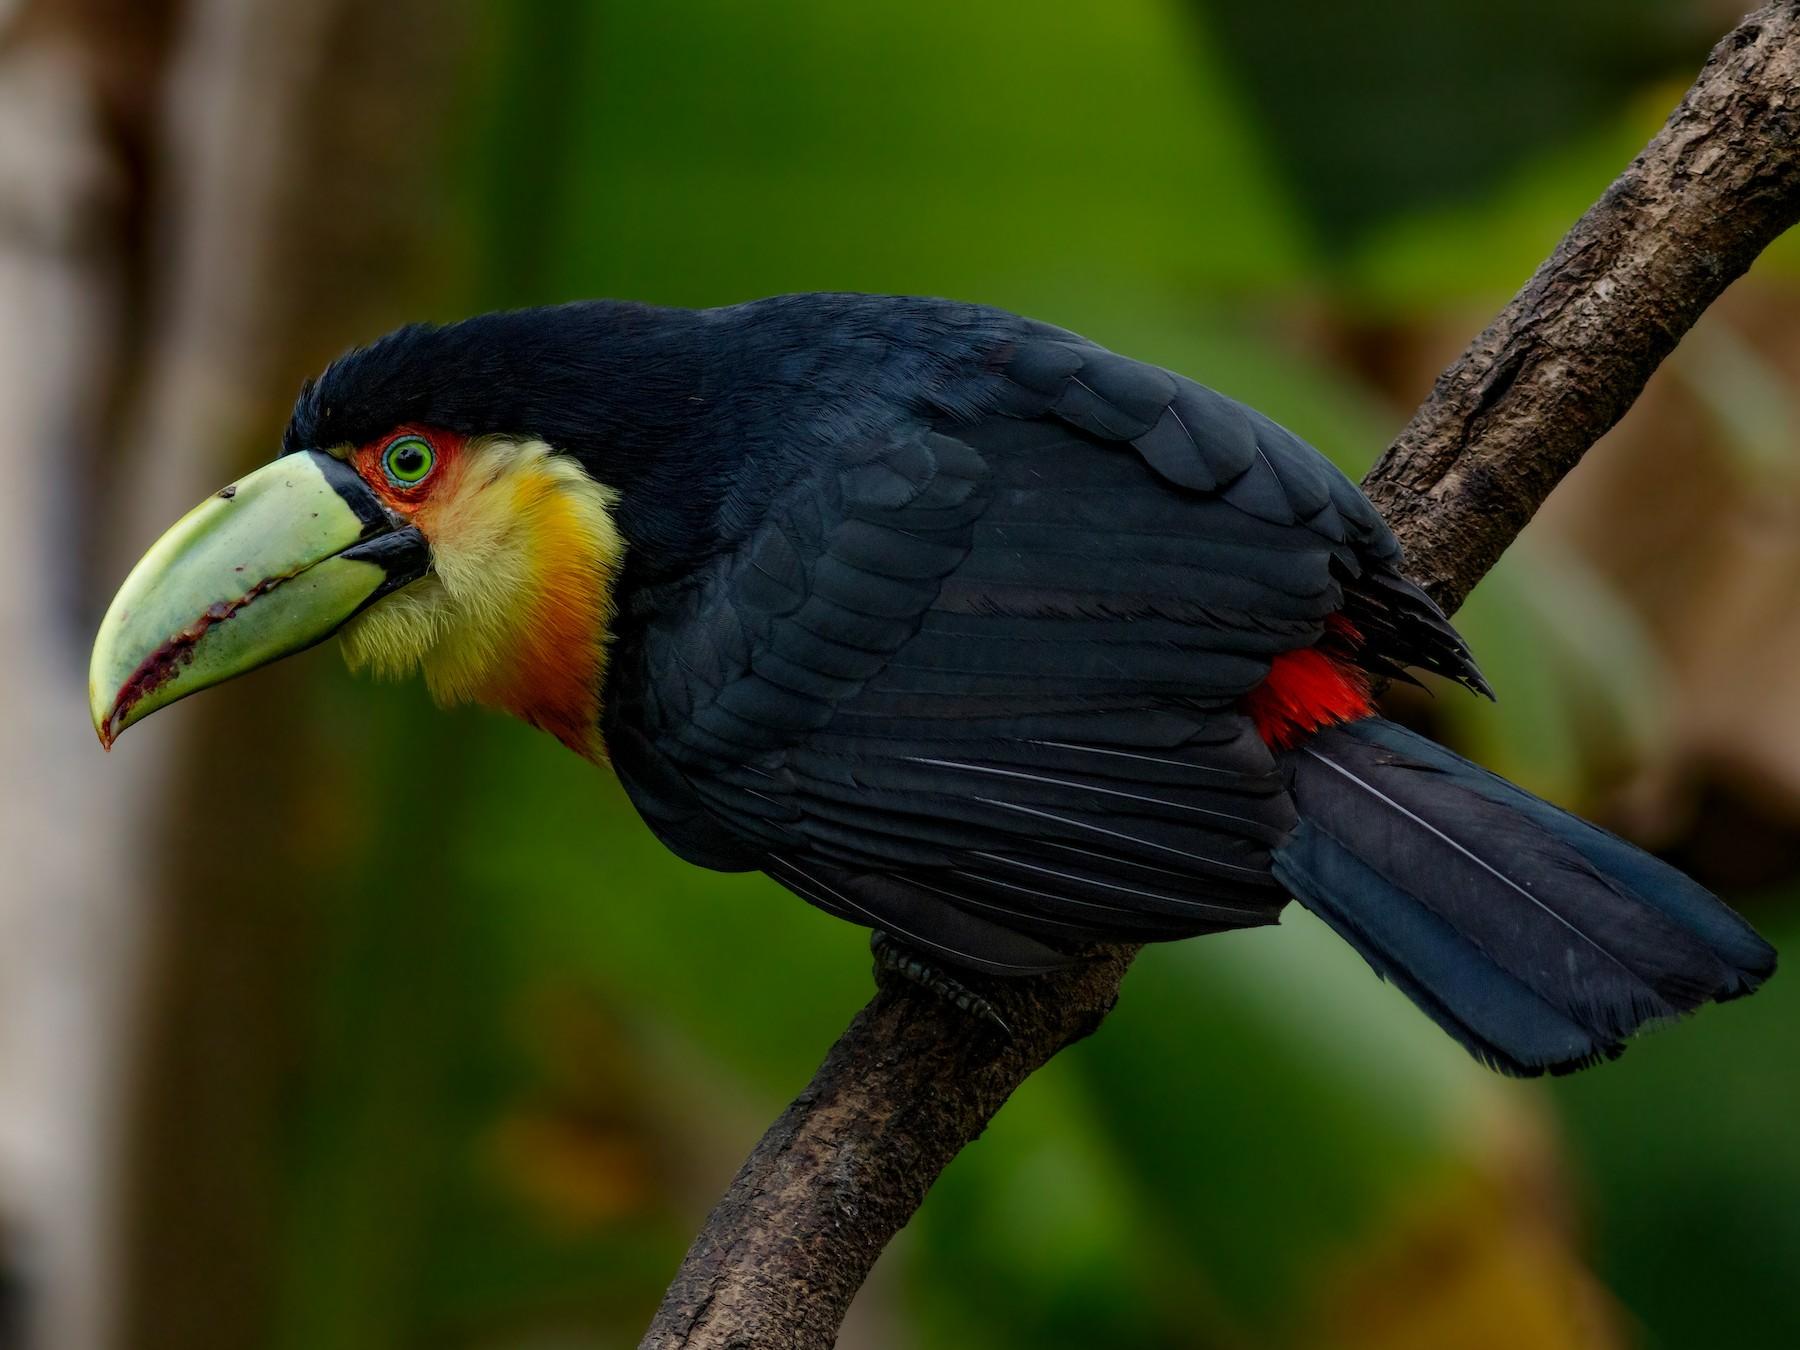 Red-breasted Toucan - Kacau Oliveira